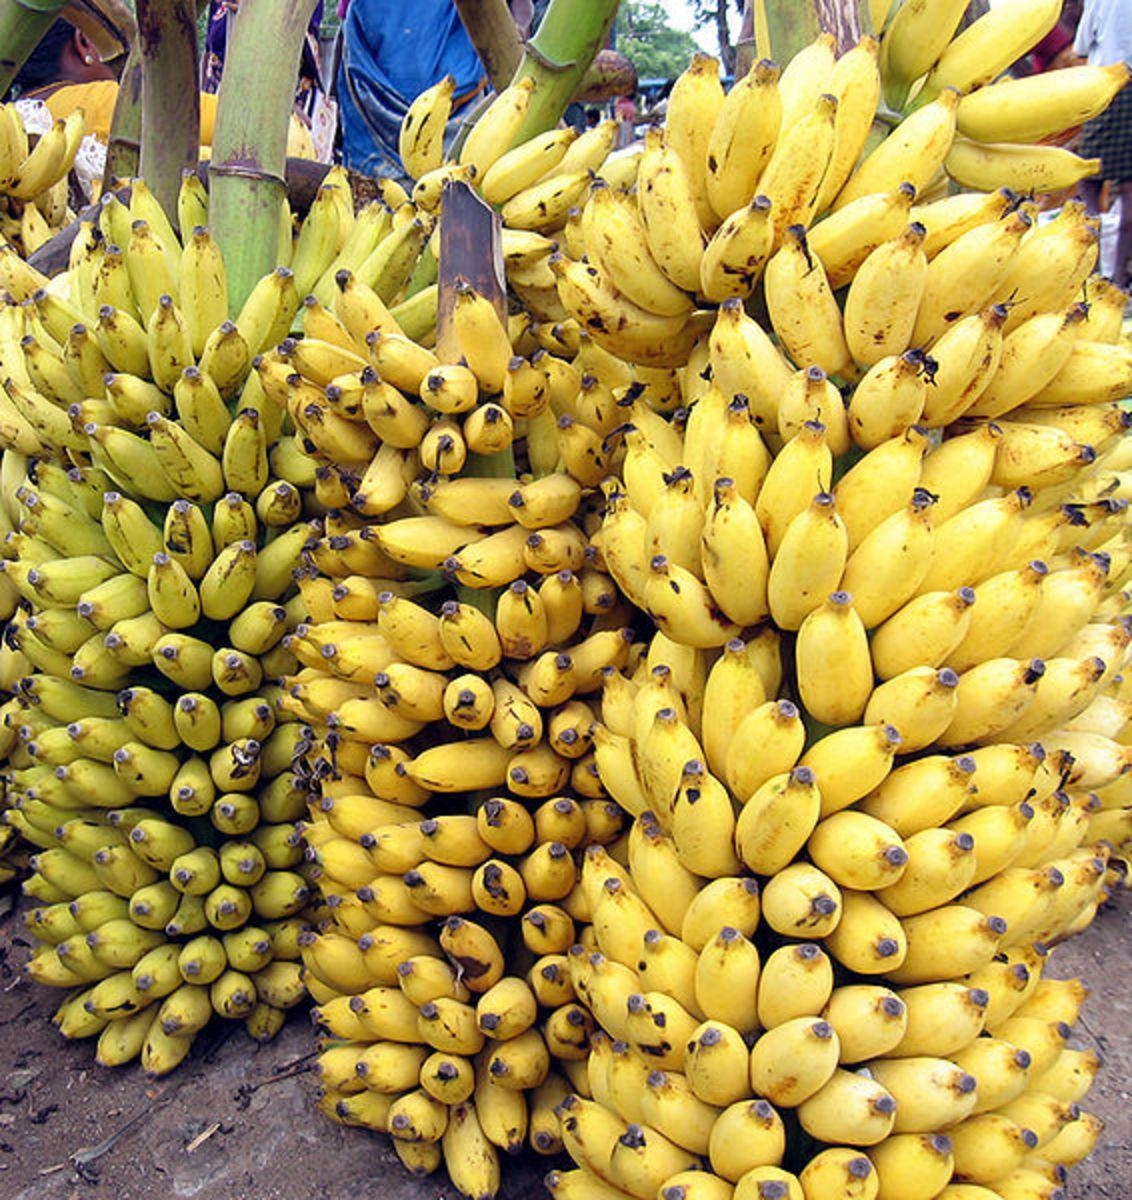 Ripe Bananas, source: Wikipedia